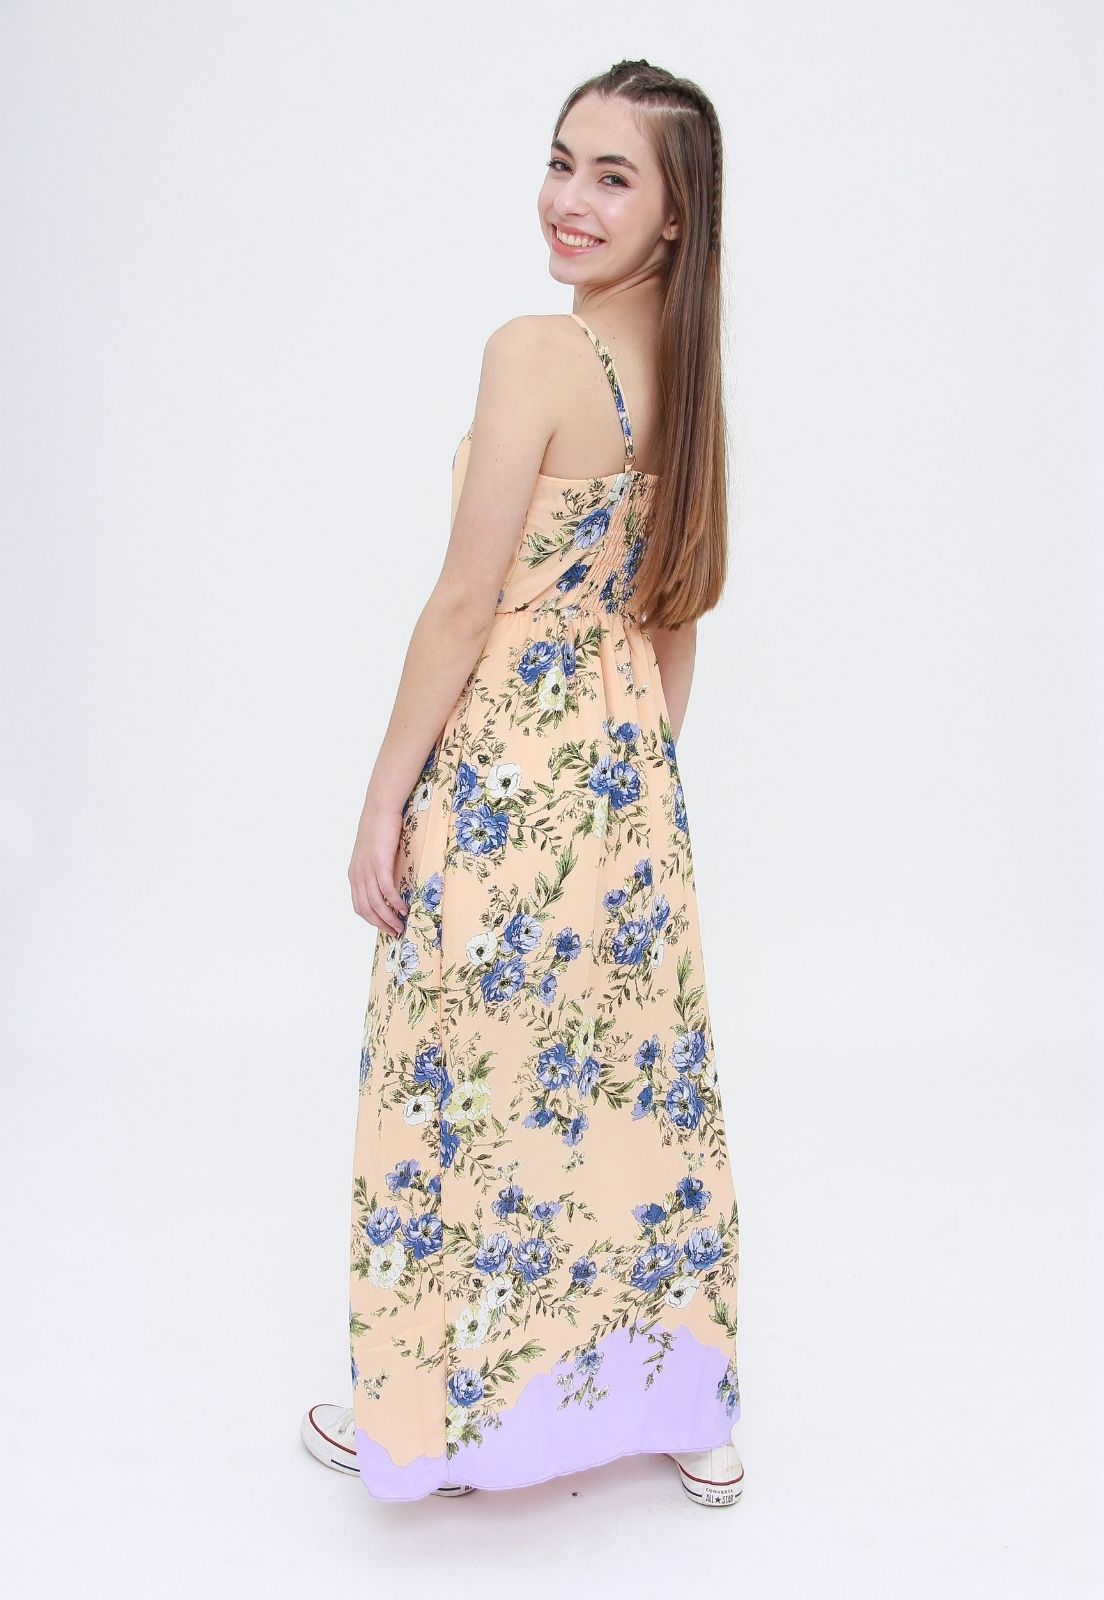 Vestido Longo Lavander Flowers  - Metro & Co.